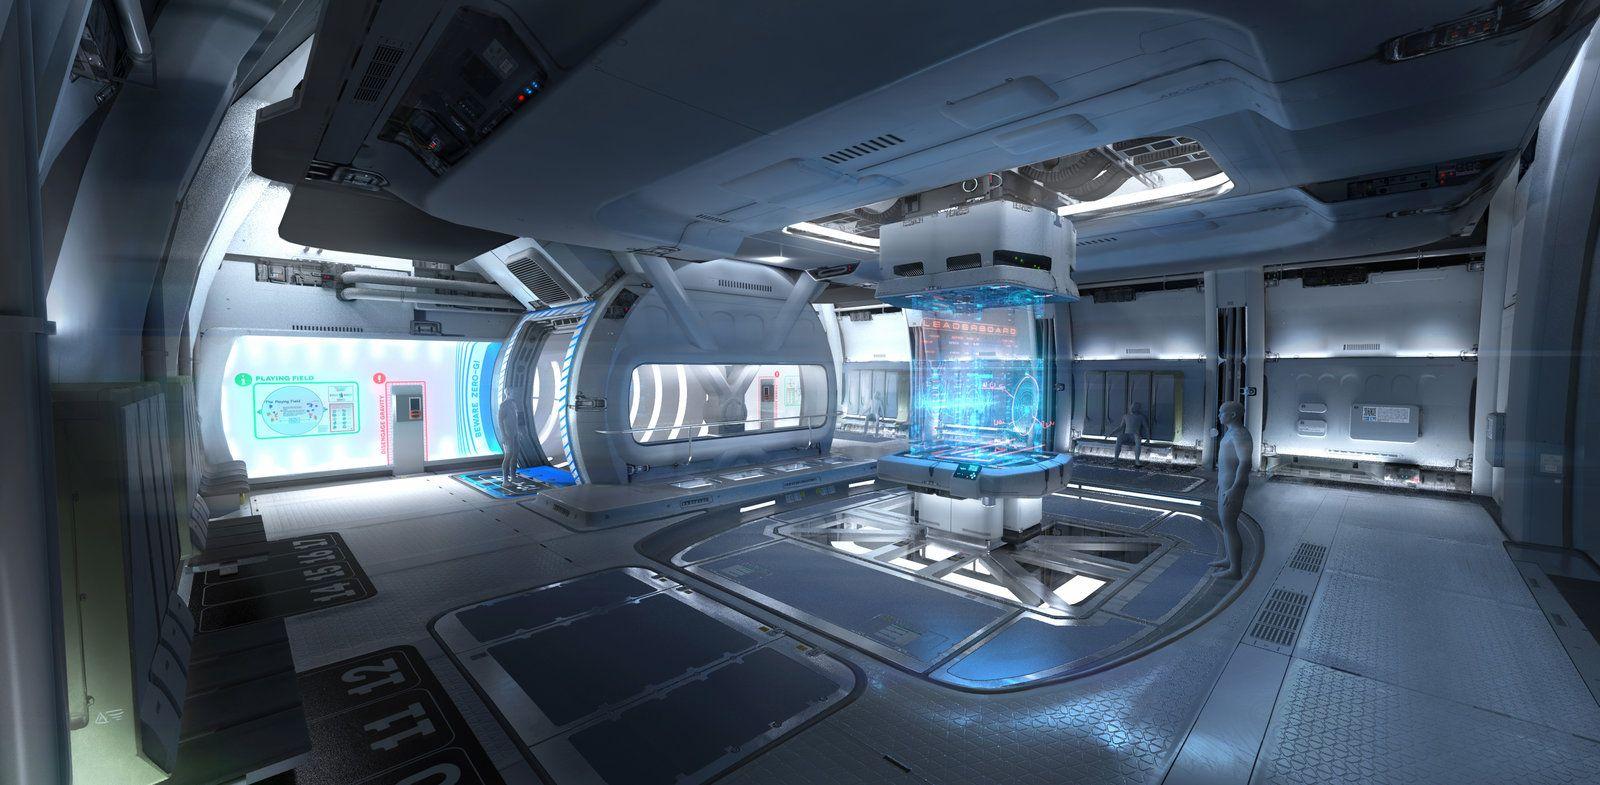 внутри космического корабля картинки казаки вермахте